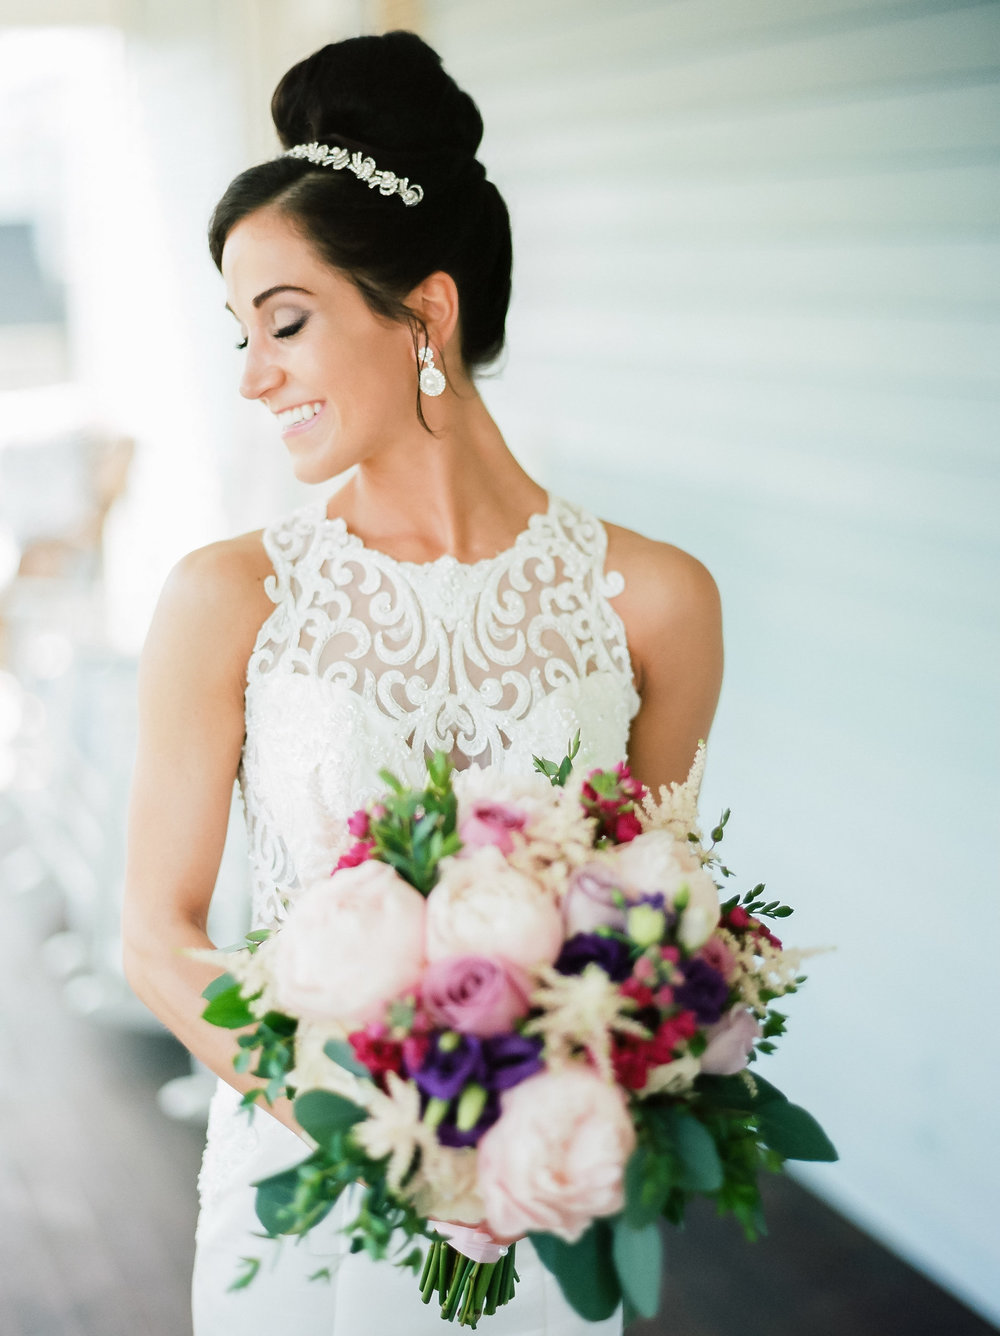 MagdalenaStudios_WeddingPhotographer_WillowCreekWinery_CarissaJoe-203.jpg